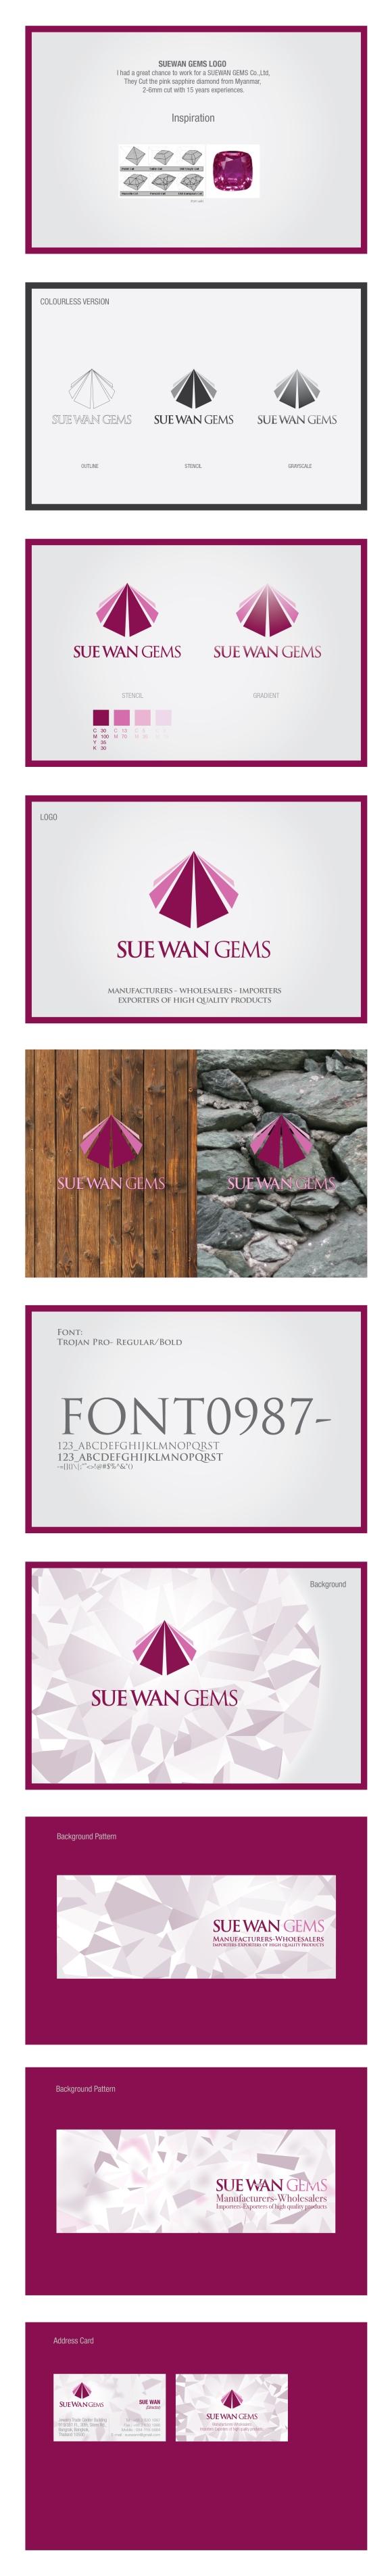 a New Branding Corporate Identity